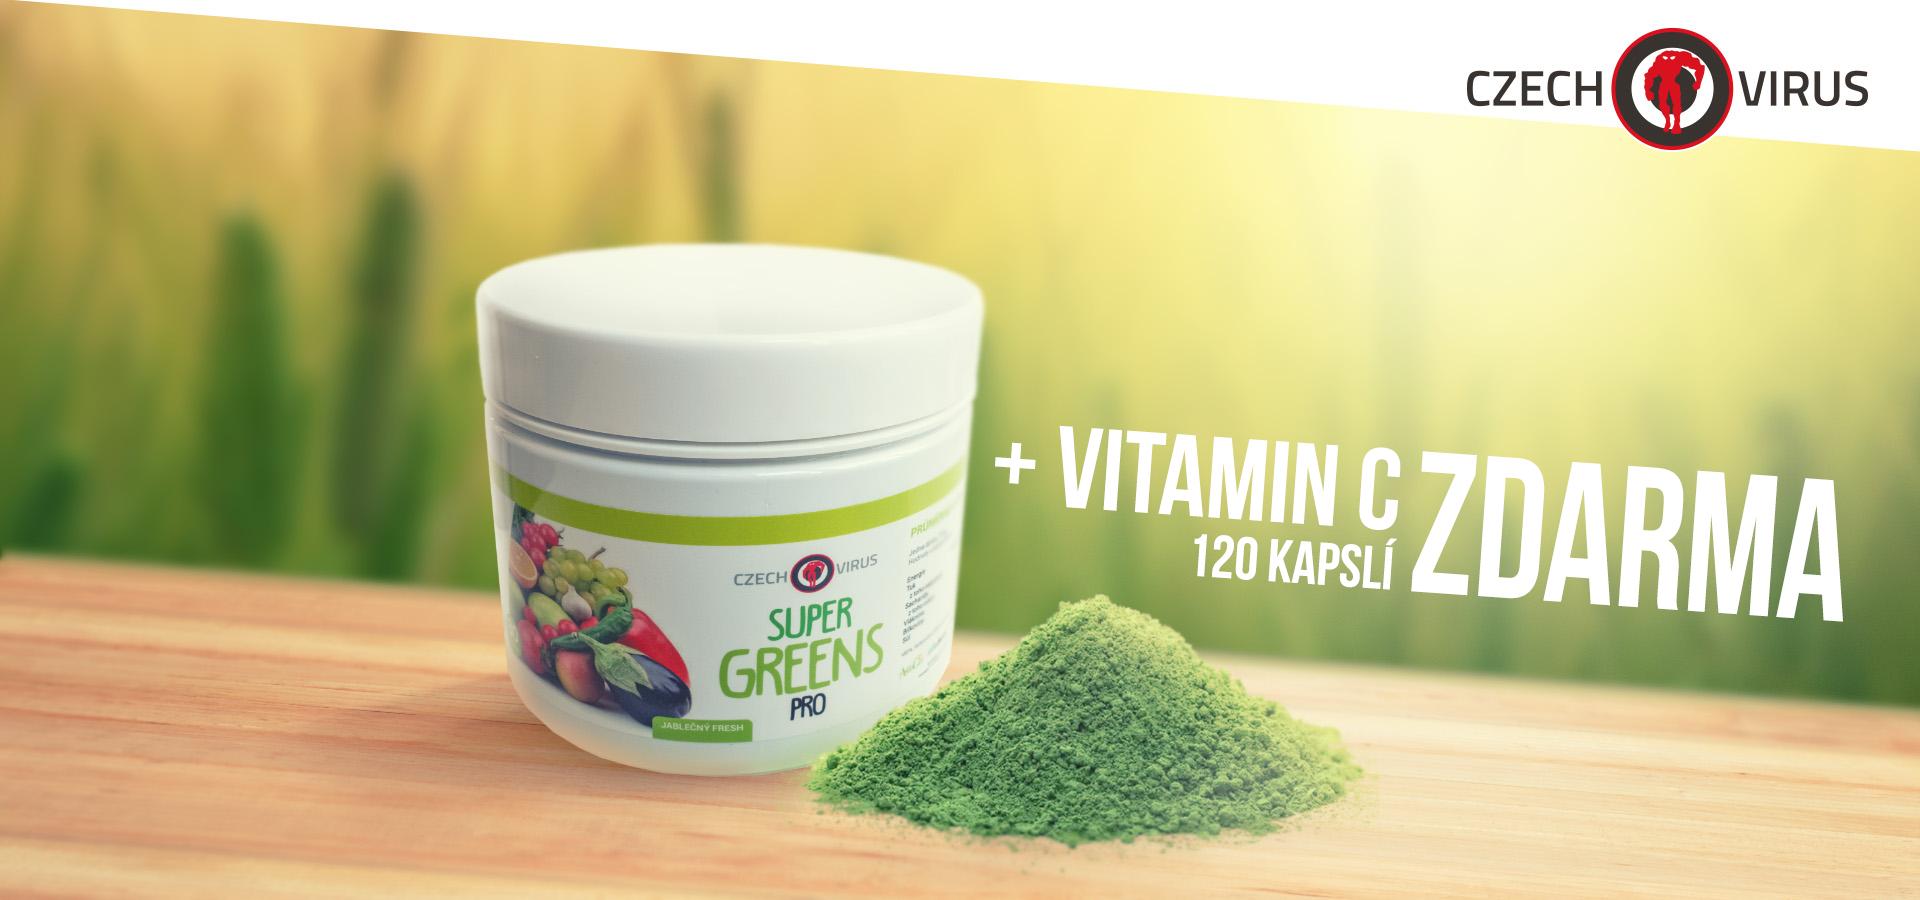 Super Greens PRO + Vitamin C ZDARMA